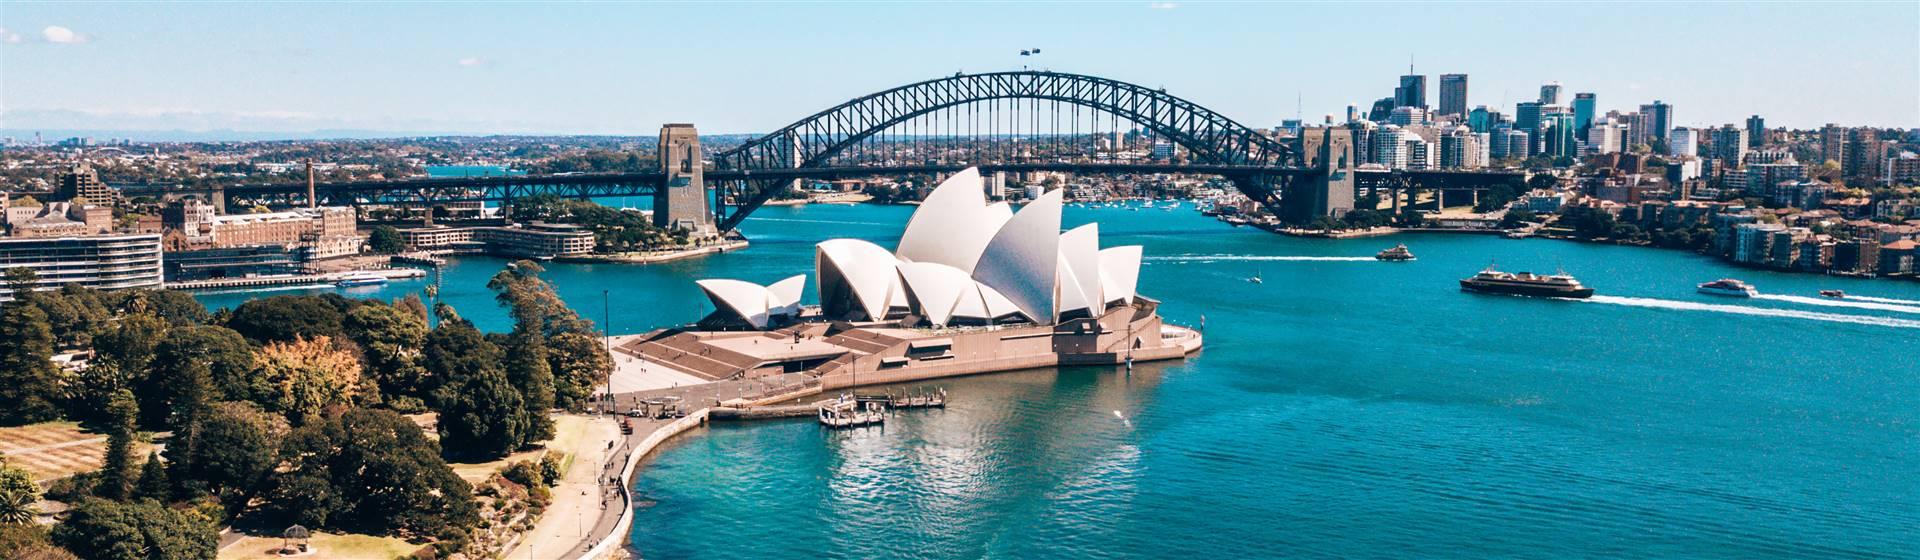 "<img src=""sydneyharbour-adobestock_243446992.jpeg"" alt=""Sydney Harbour""/>"